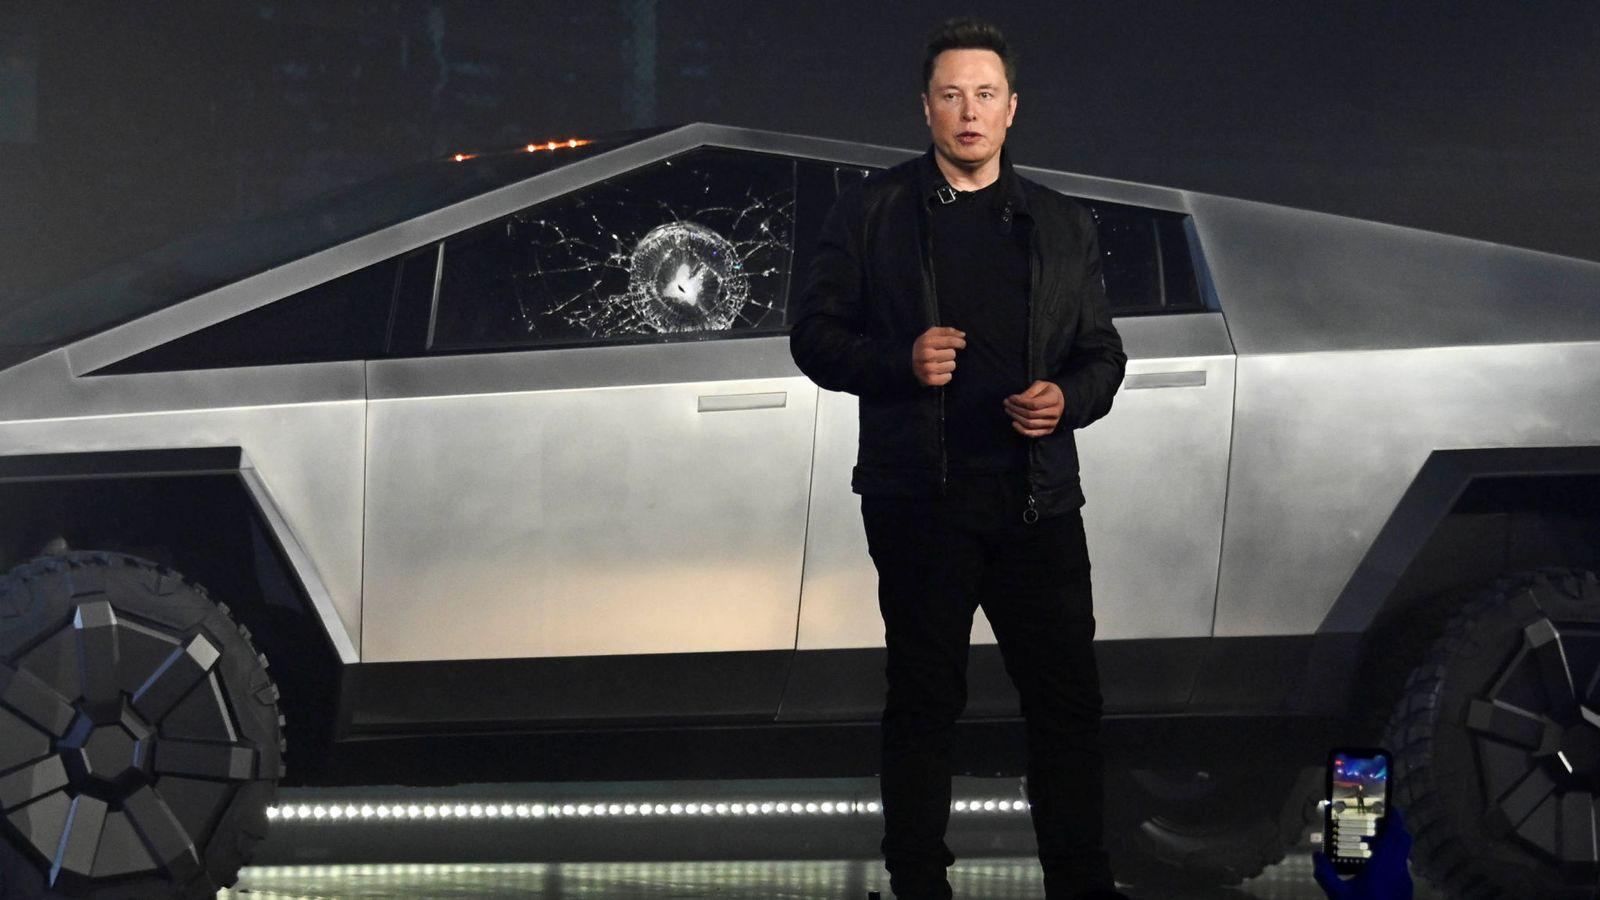 Elon Musk boasts of nearly 150,000 Tesla Cybertruck orders despite launch gaffe 4